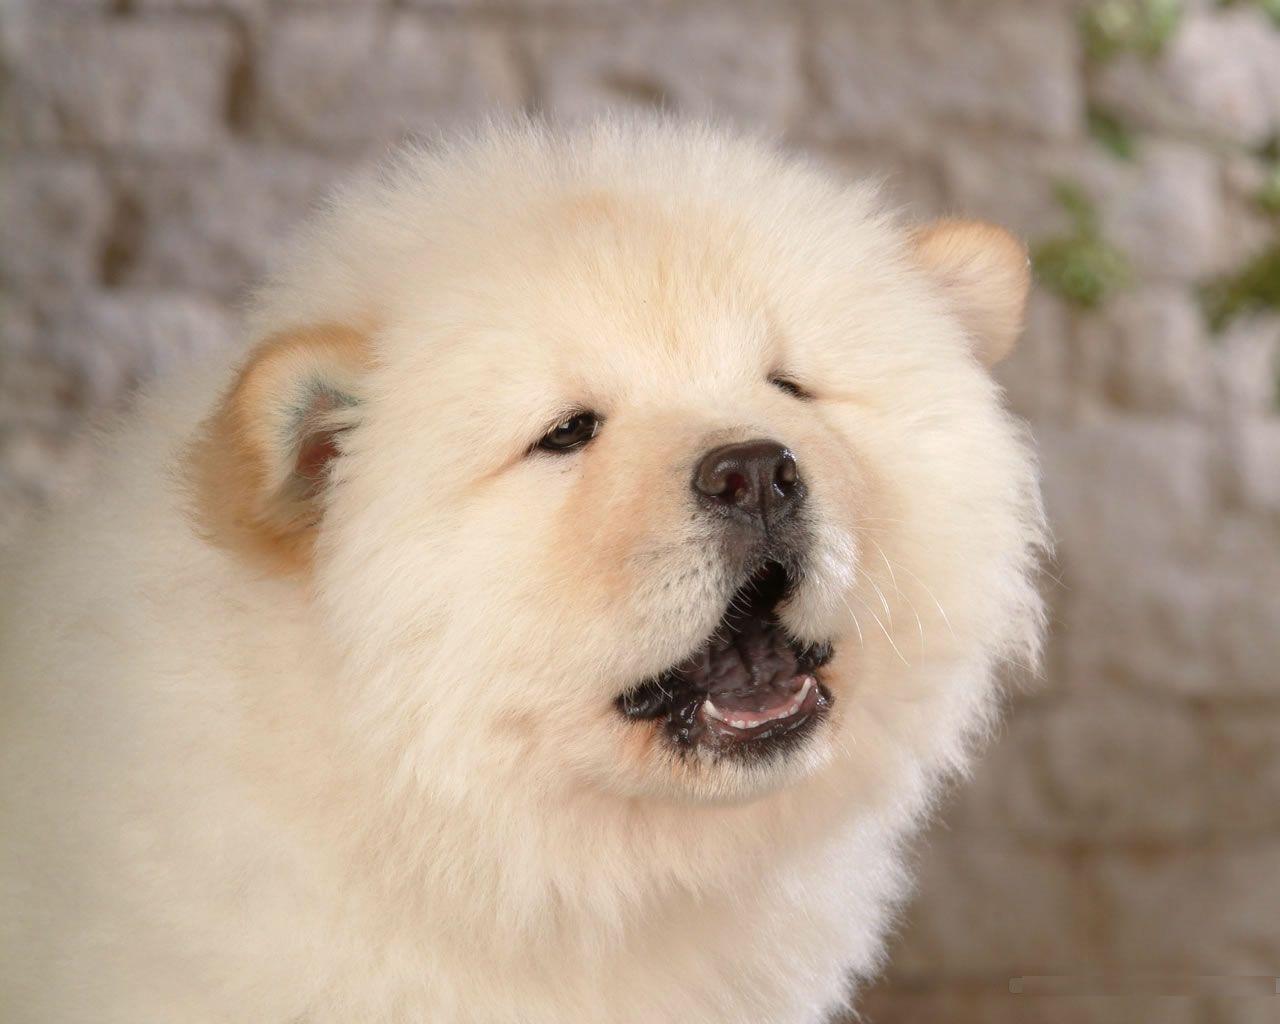 Big Cute White Dog Photo Cute Big Dogs Cute White Dogs Chow